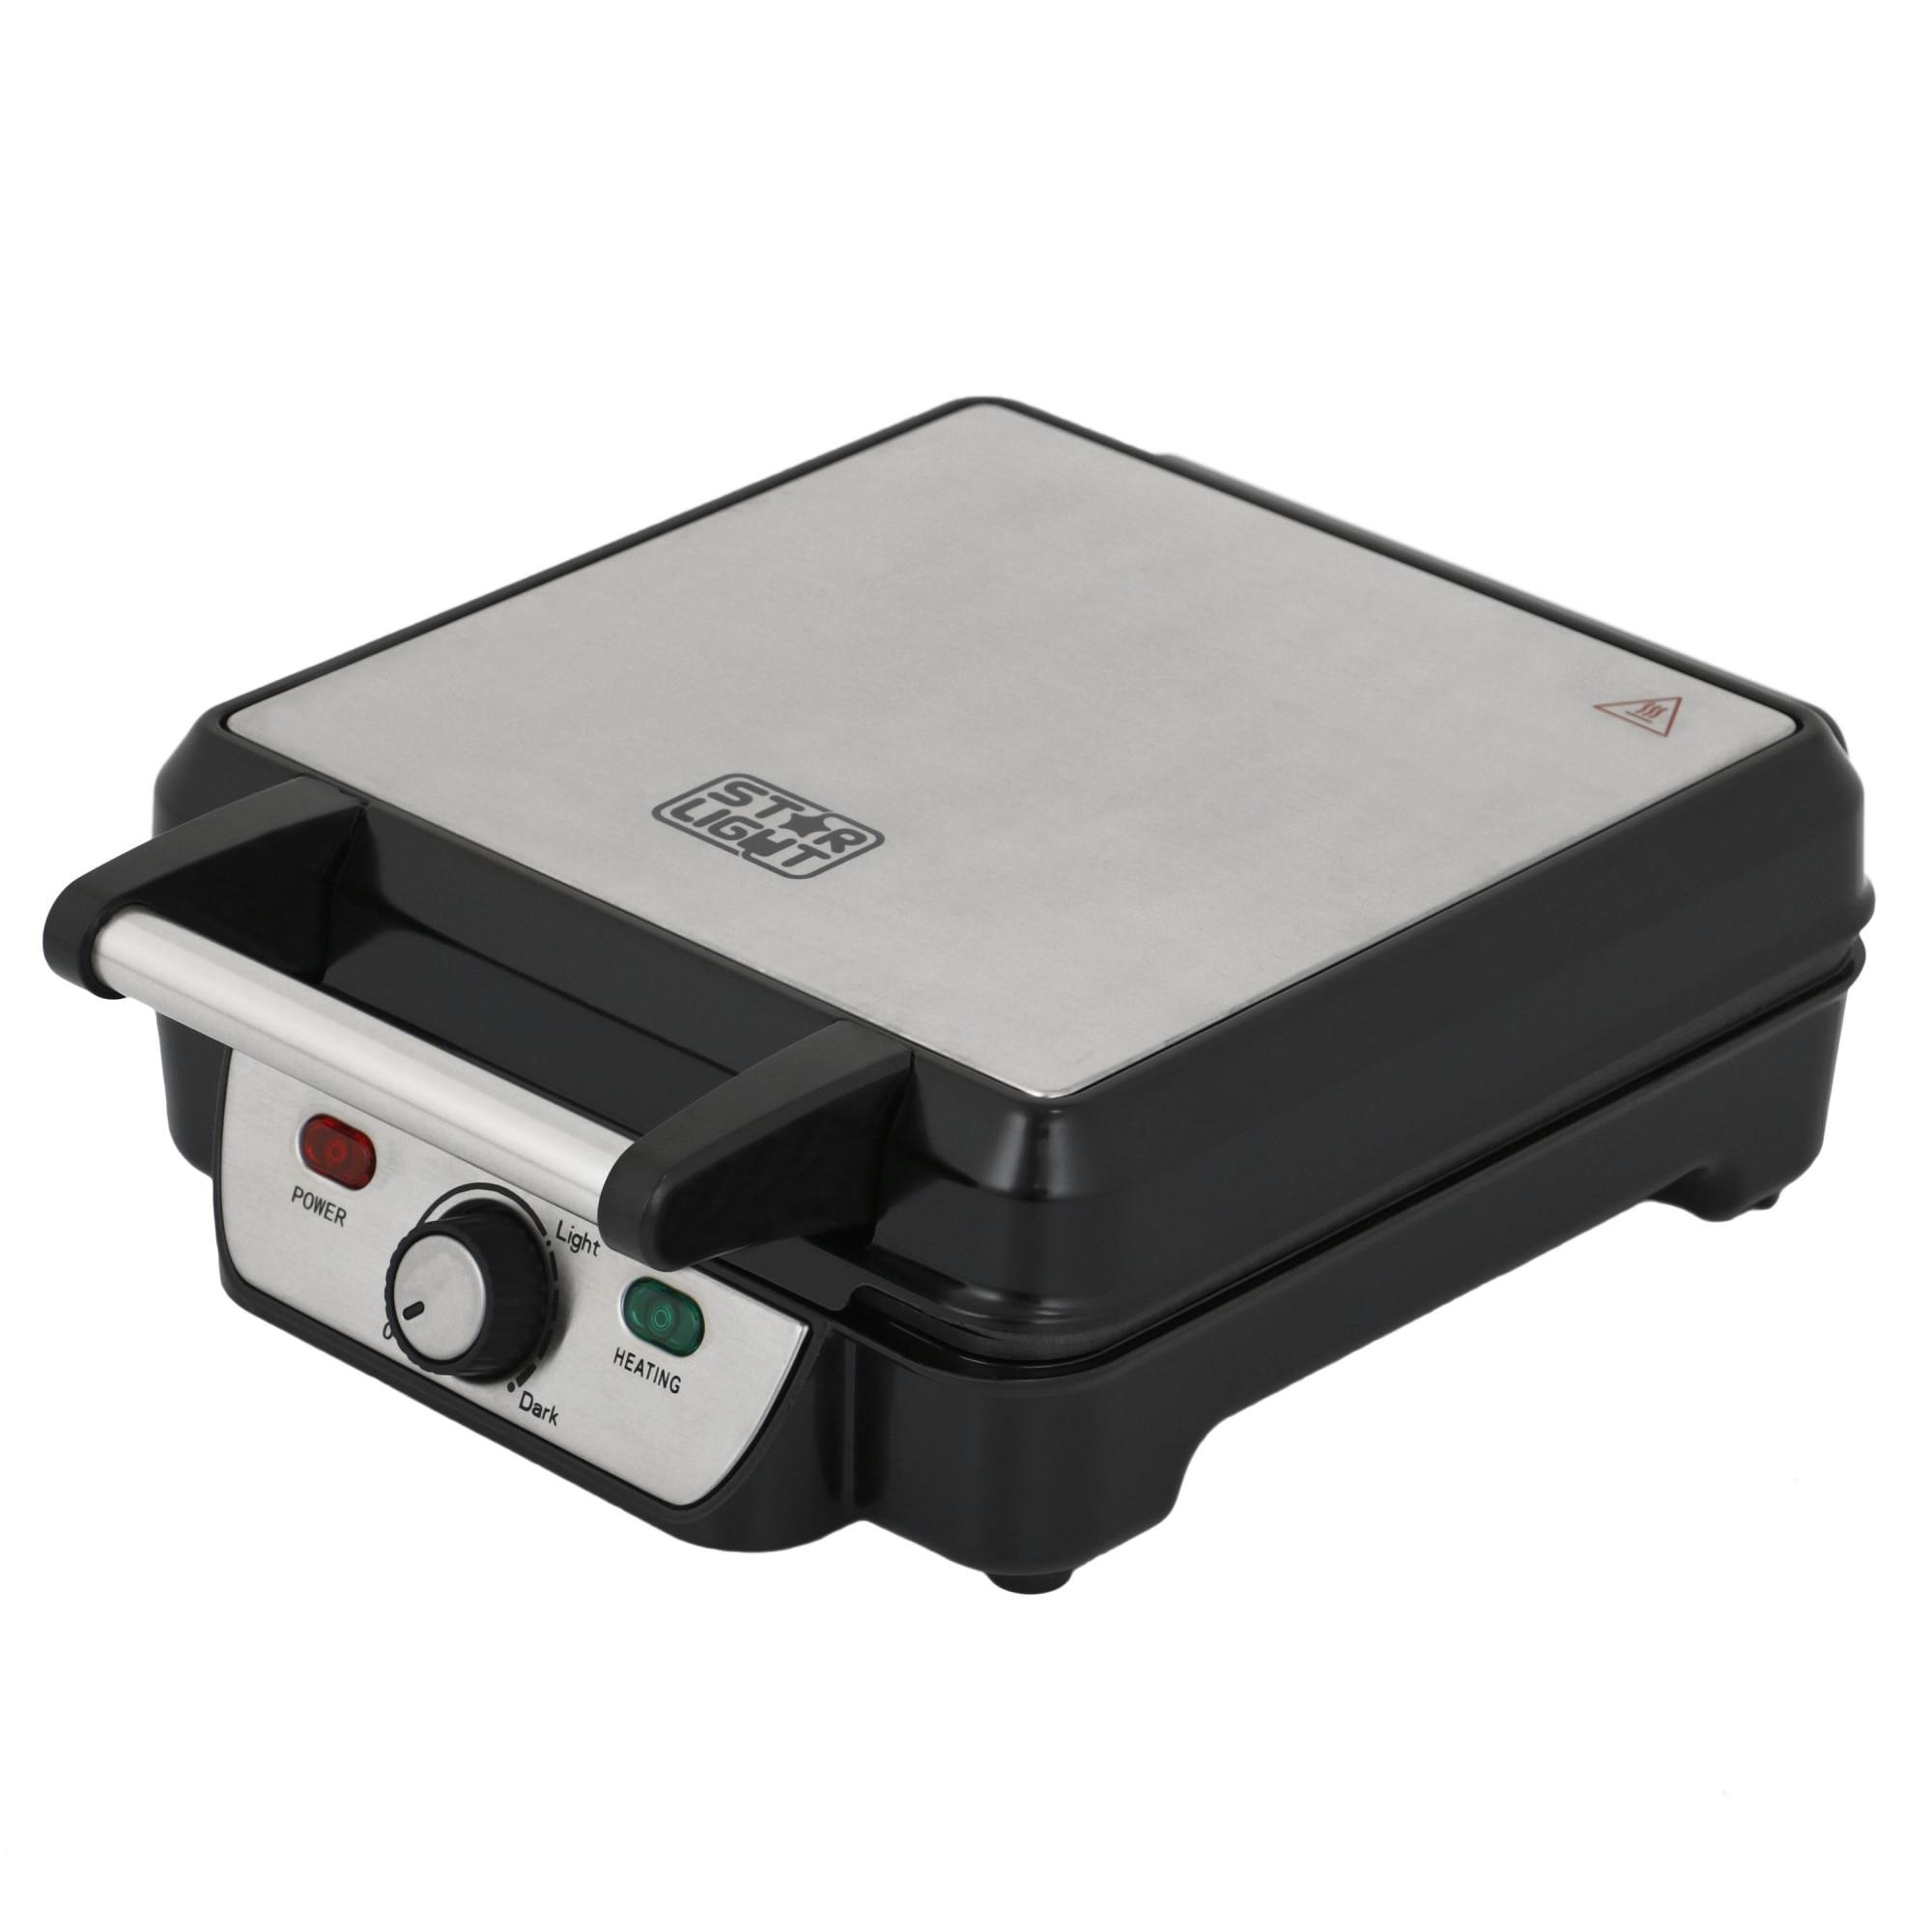 Fotografie Aparat pentru preparat vafe/gofre Star-Light WMH-1100W, 1100W, Termostat ajustabil, Inox